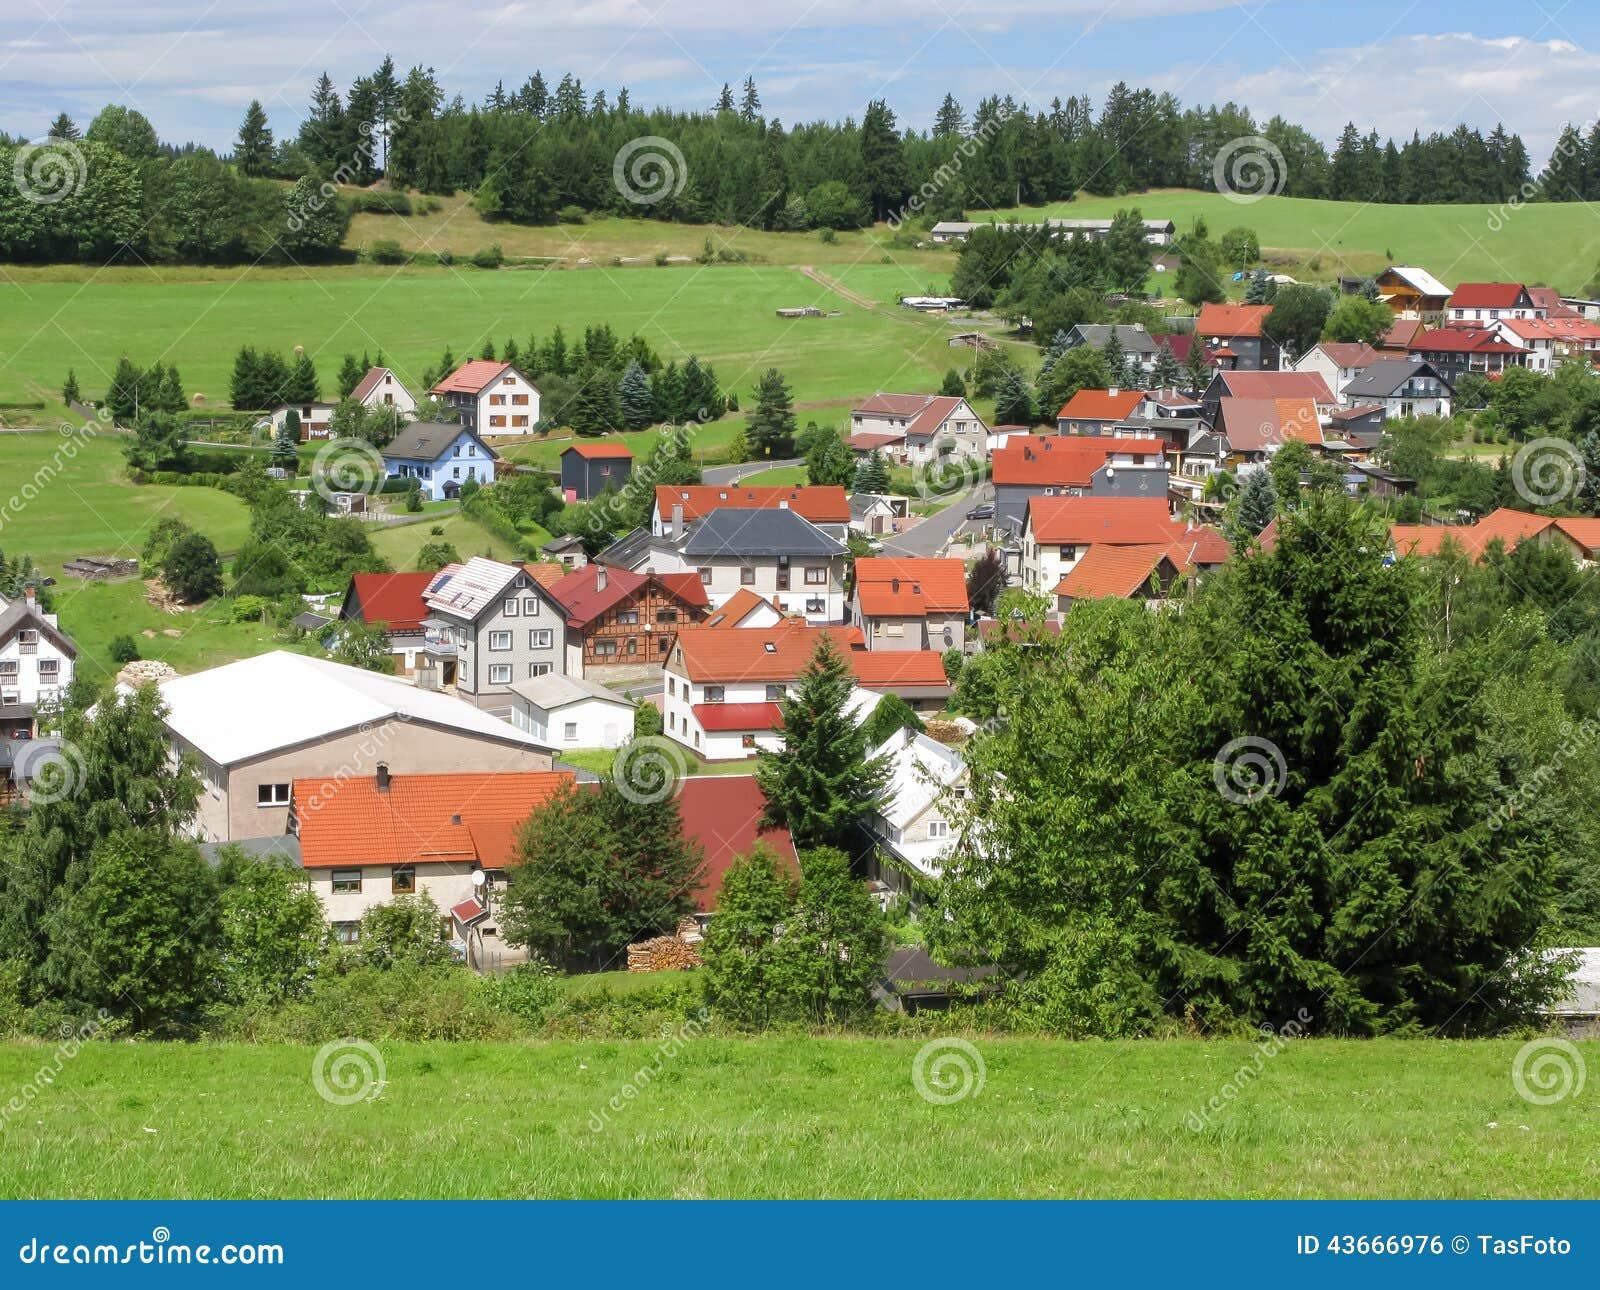 File:Schmidhausen (Langenbach) 2.jpg - Wikimedia Commons